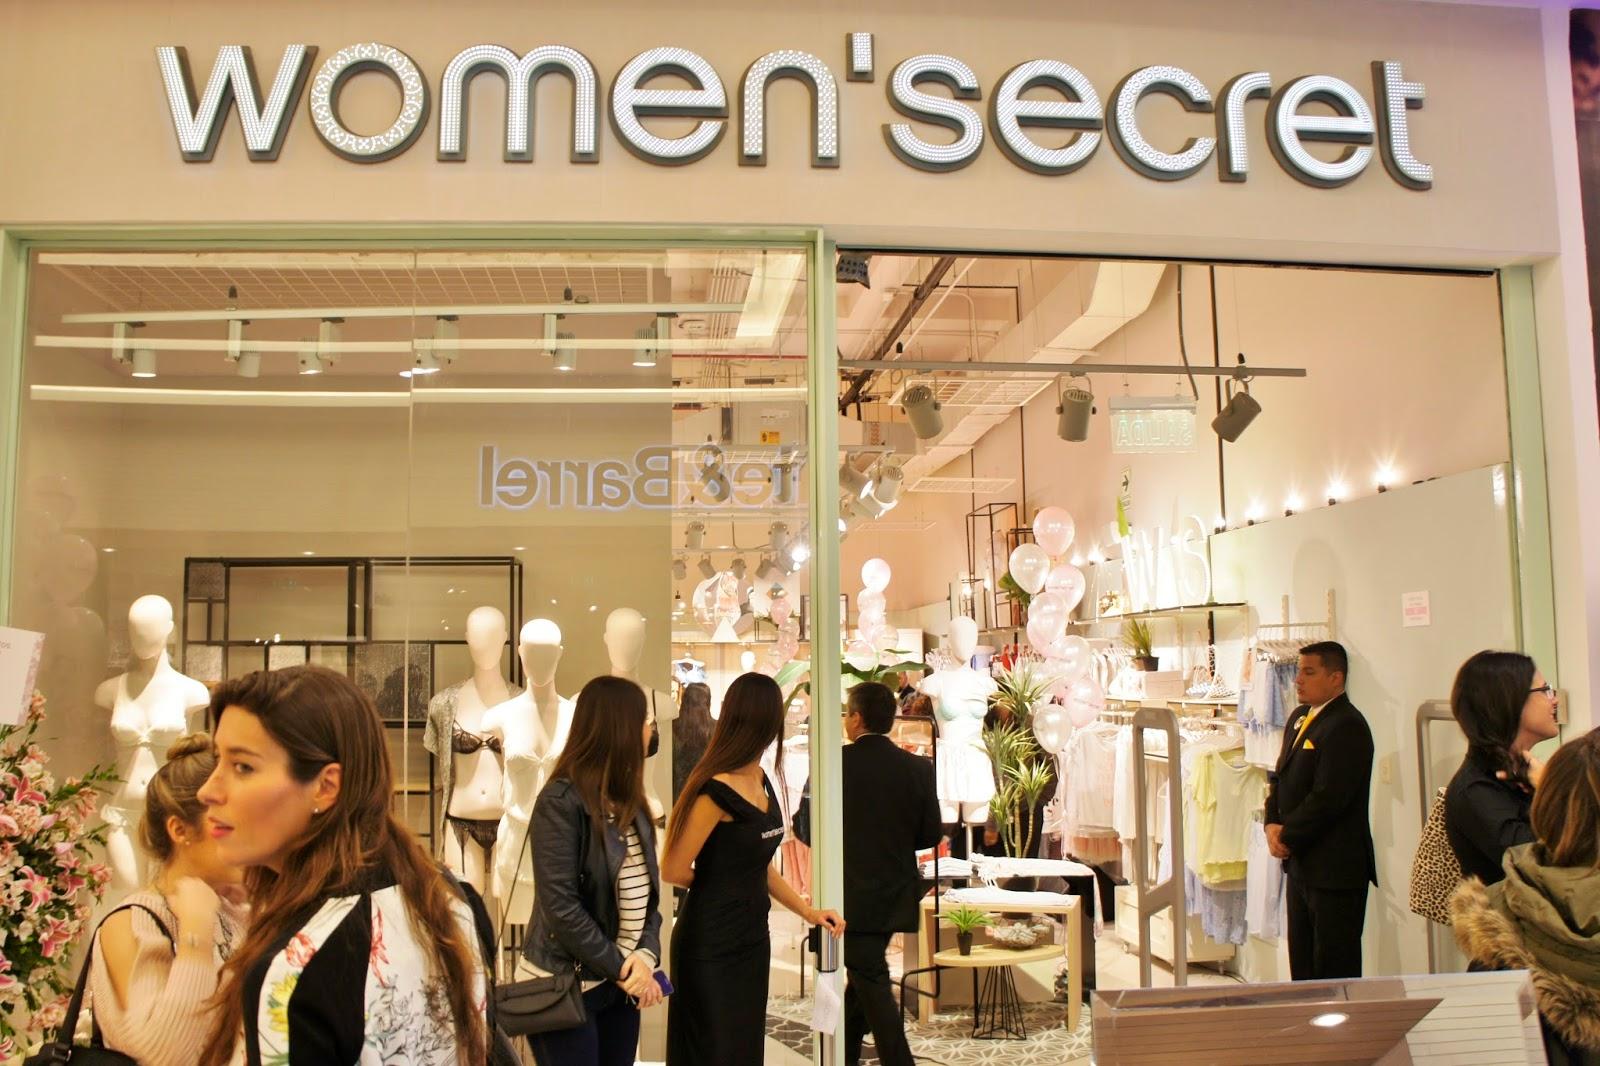 Women Secret tienda jockey plaza inauguración